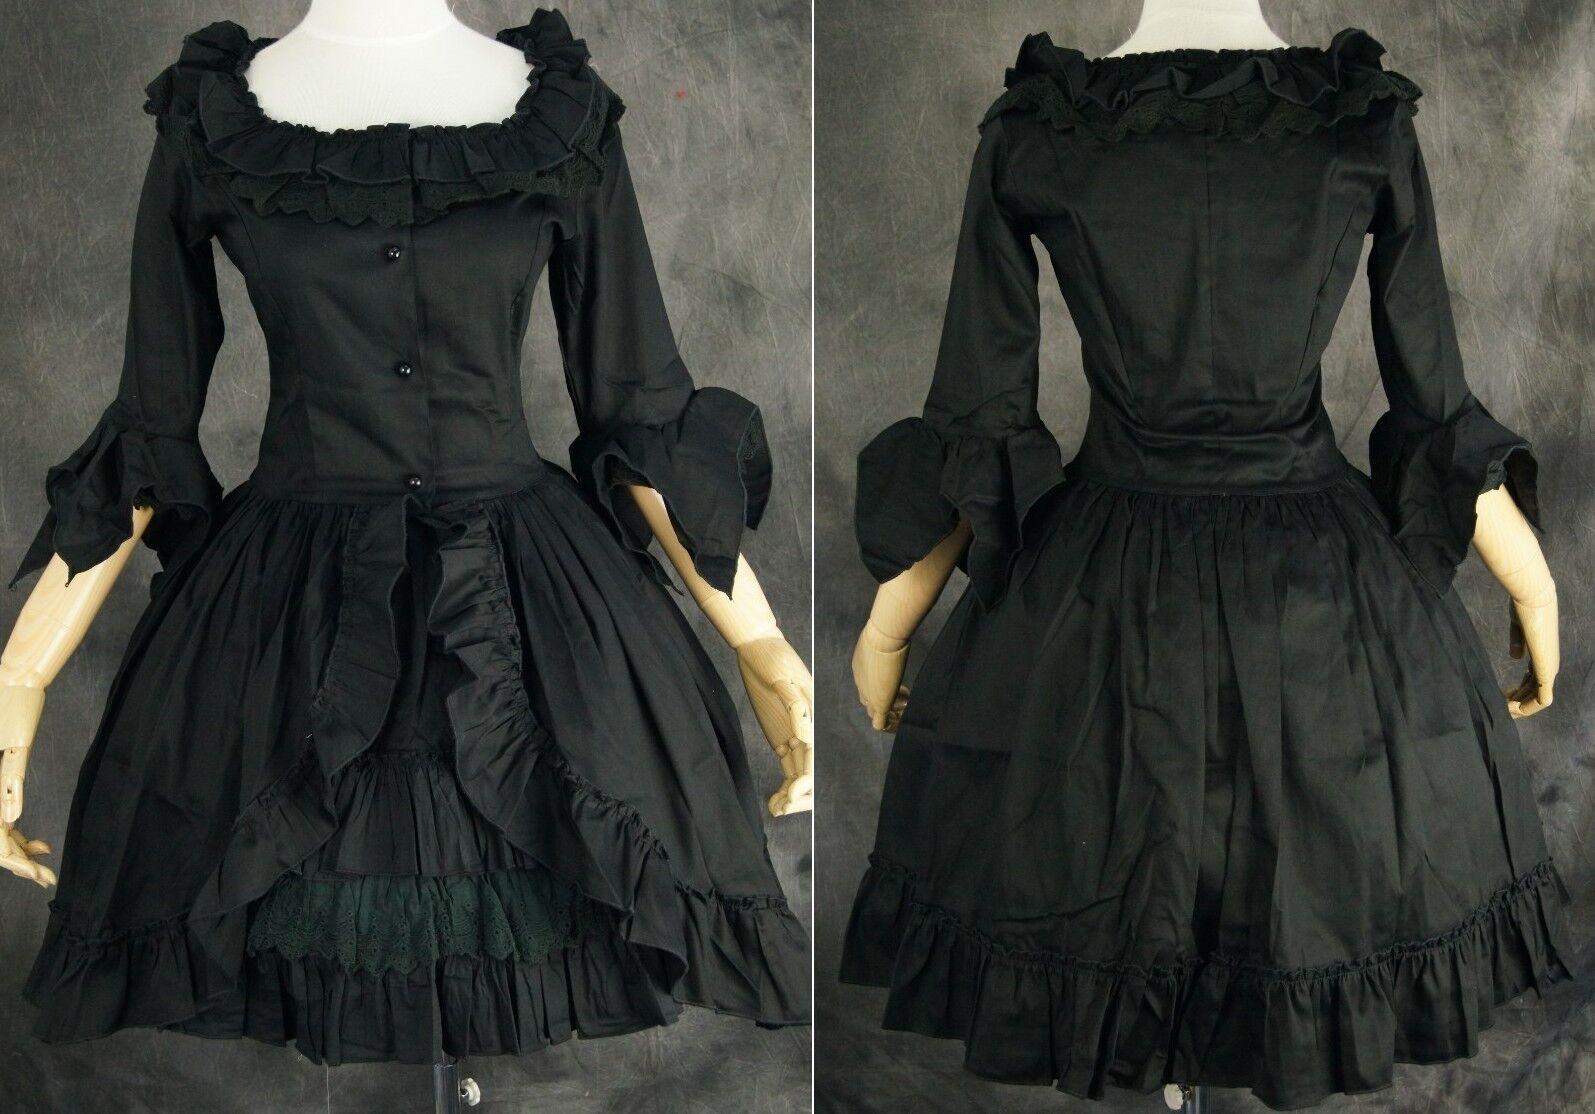 M-522 Size M Black Cosplay Gothic Lolita Dress Women's Costume Dress Anime